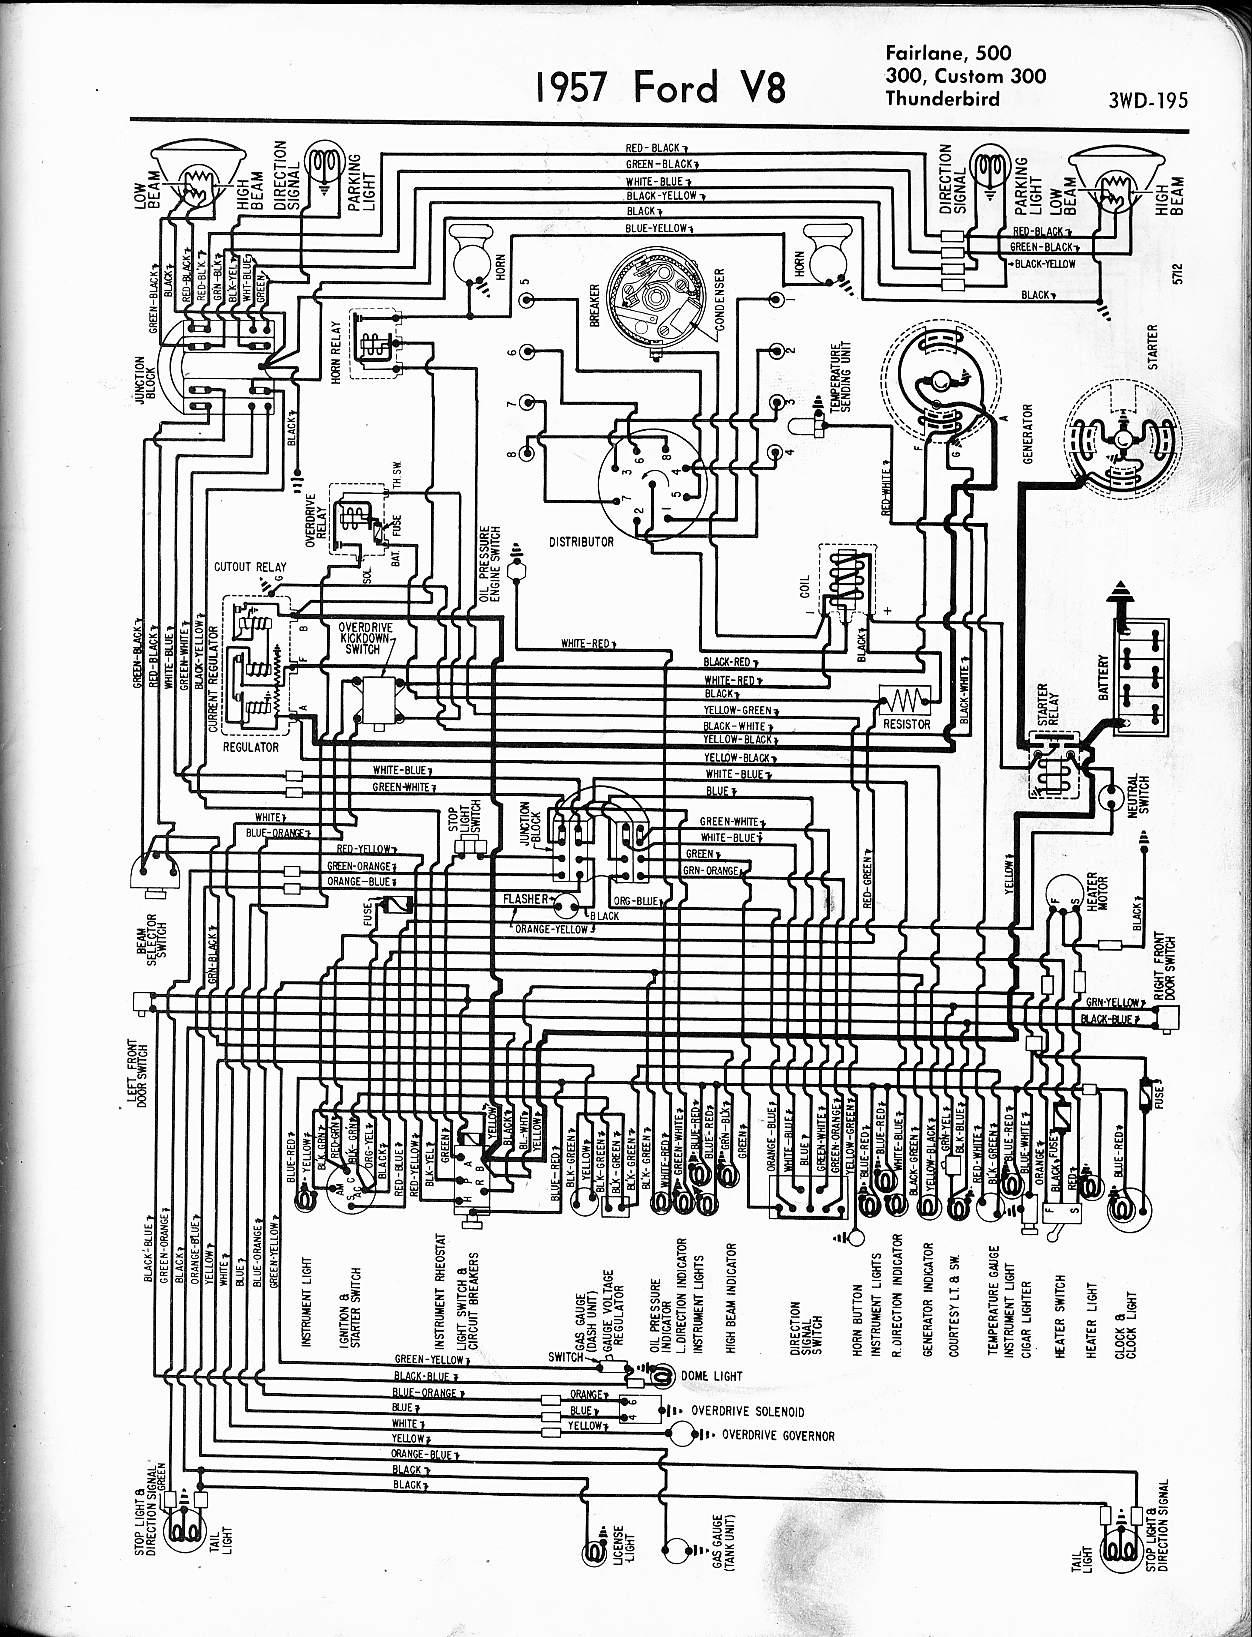 hight resolution of lincoln ac 225 wiring diagram wiring library rh 51 dirtytalk camgirls de lincoln 225 ac breakdown